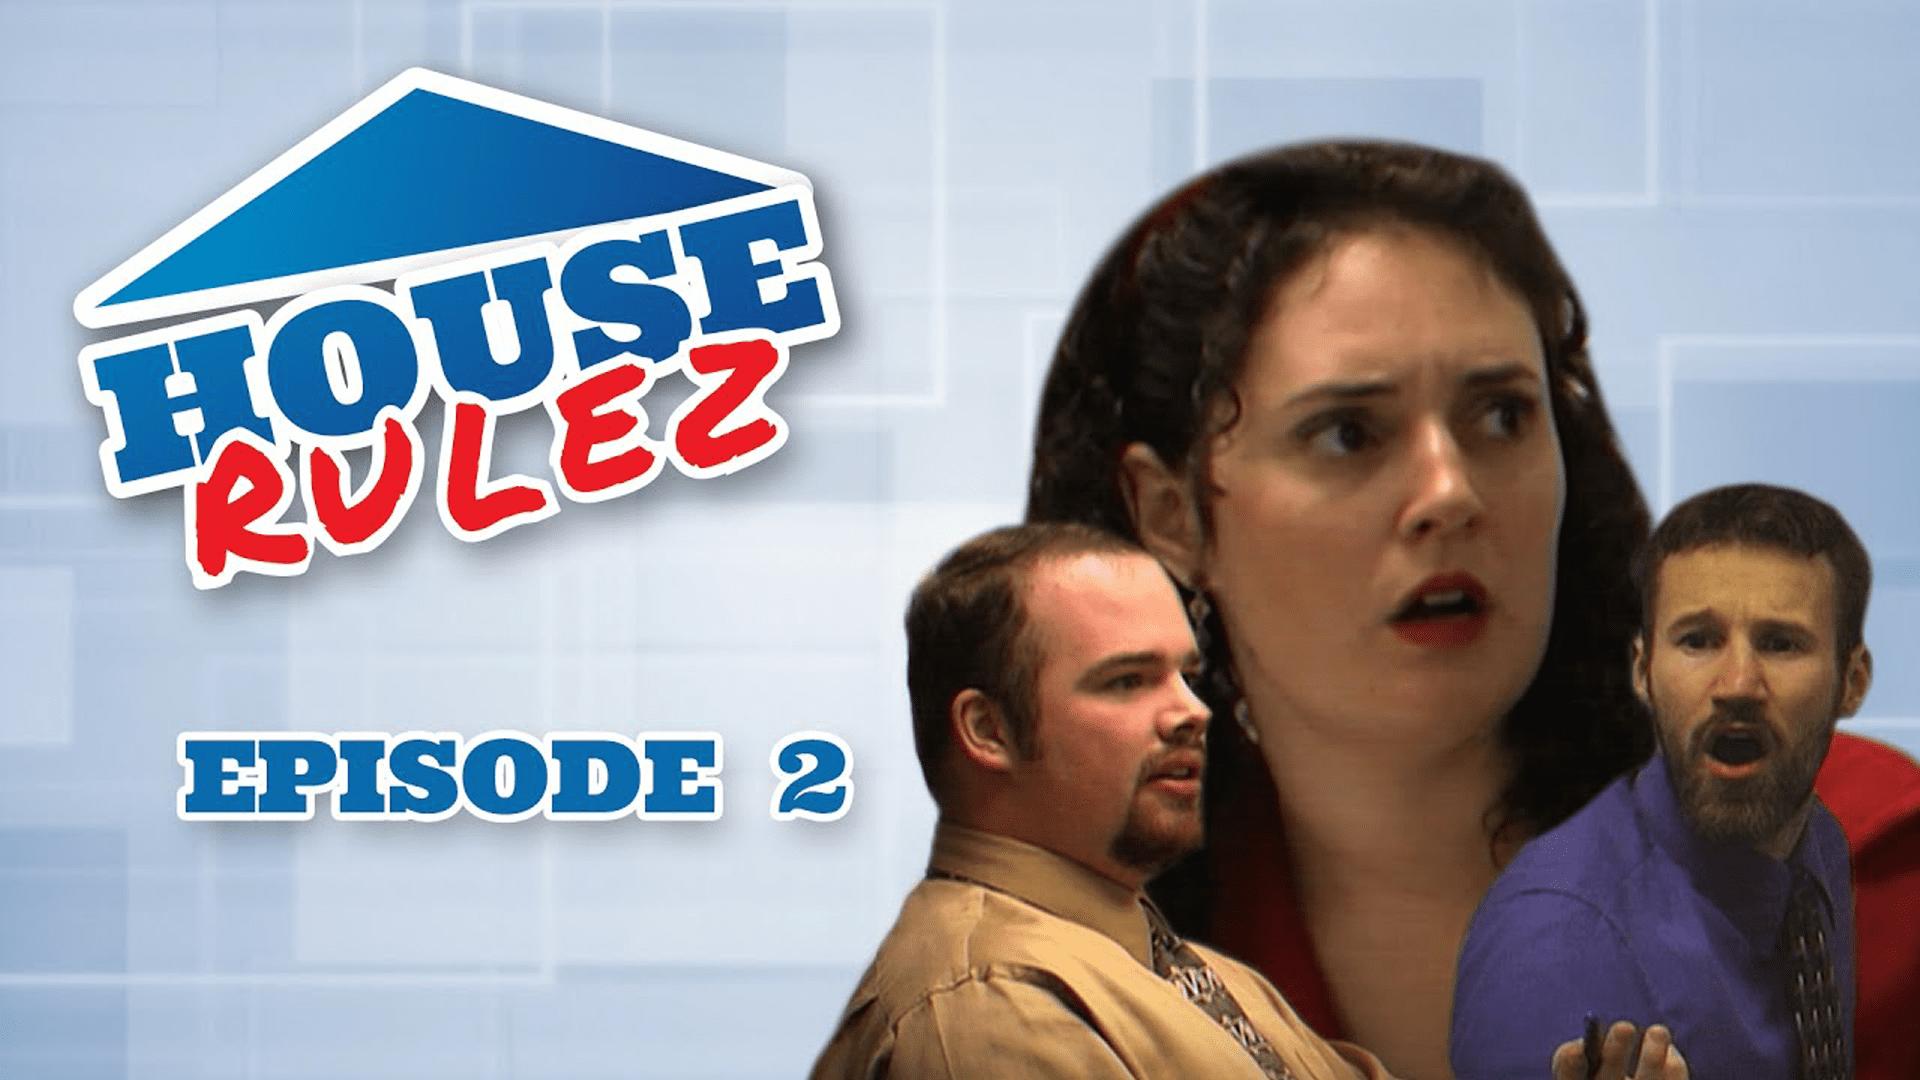 House Rulez Episode 2